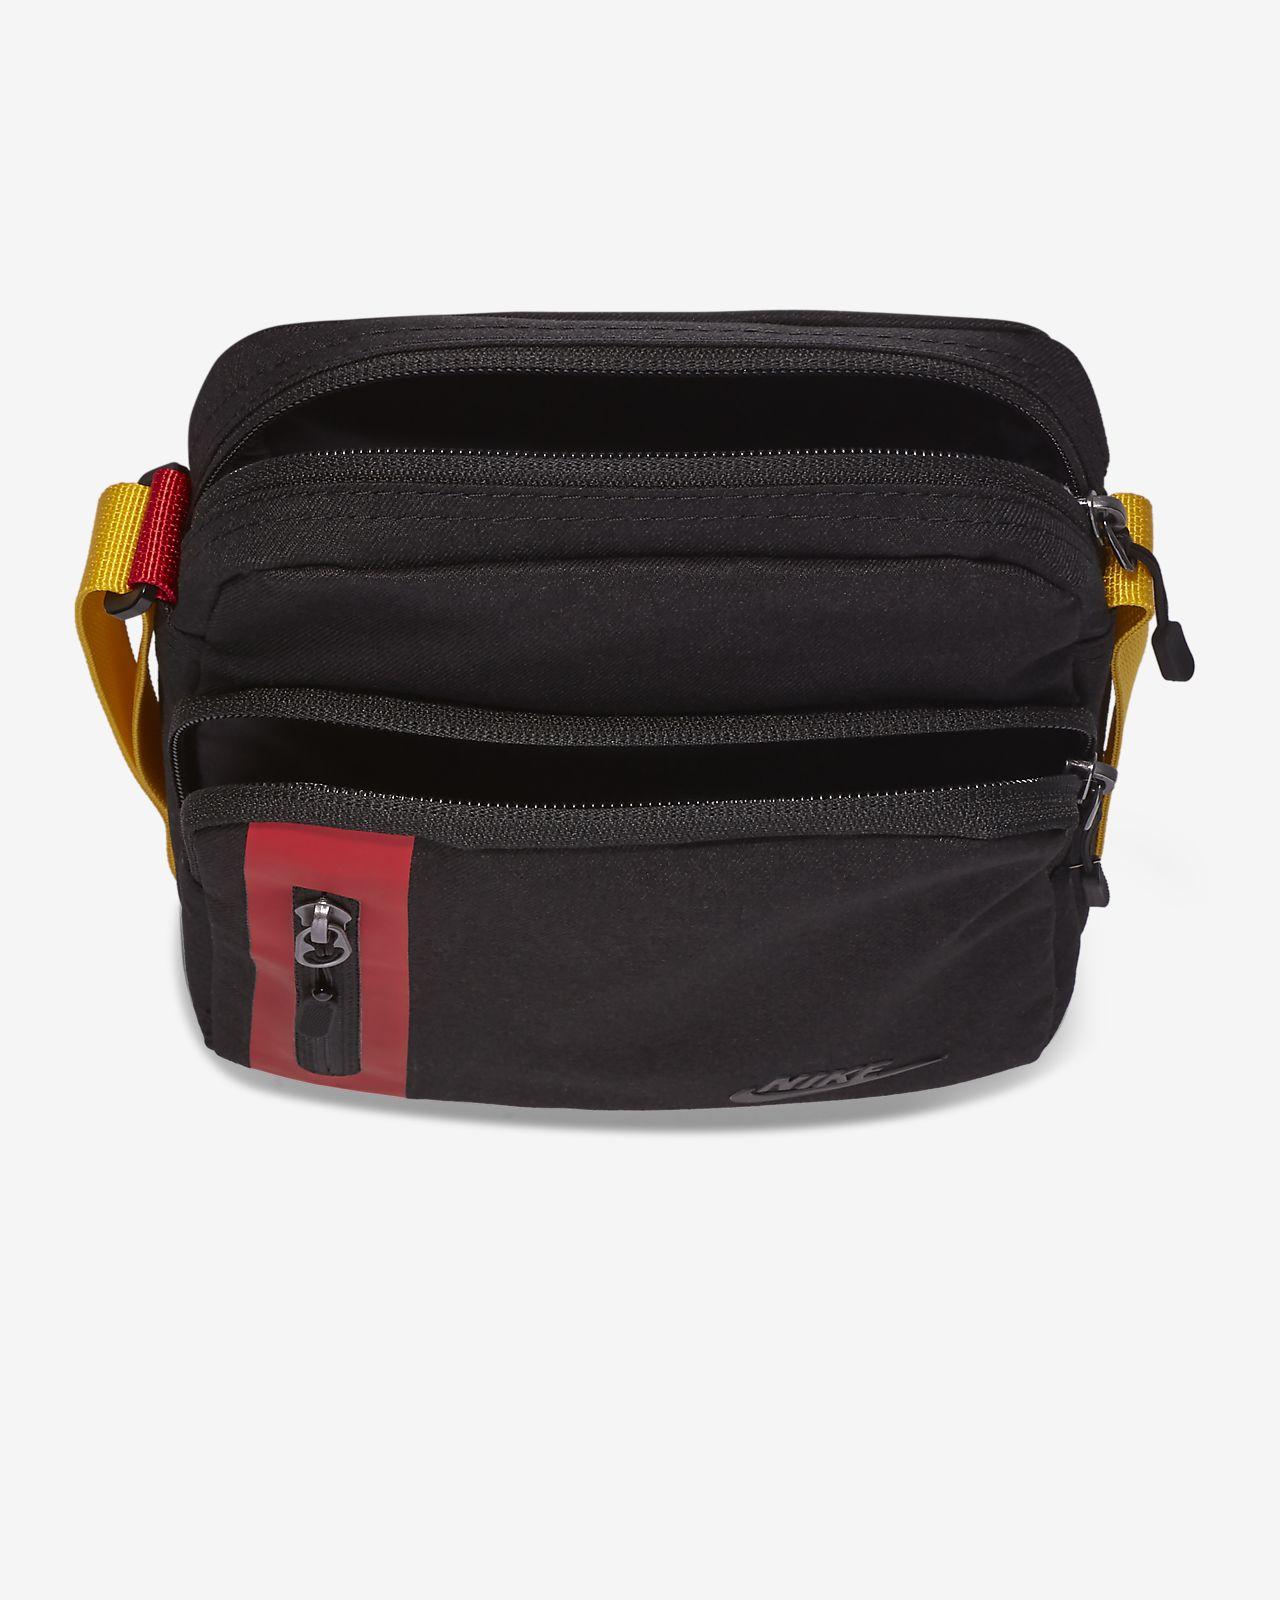 a58ea1596289 Сумка Nike Core Small Items 3.0. Nike.com RU